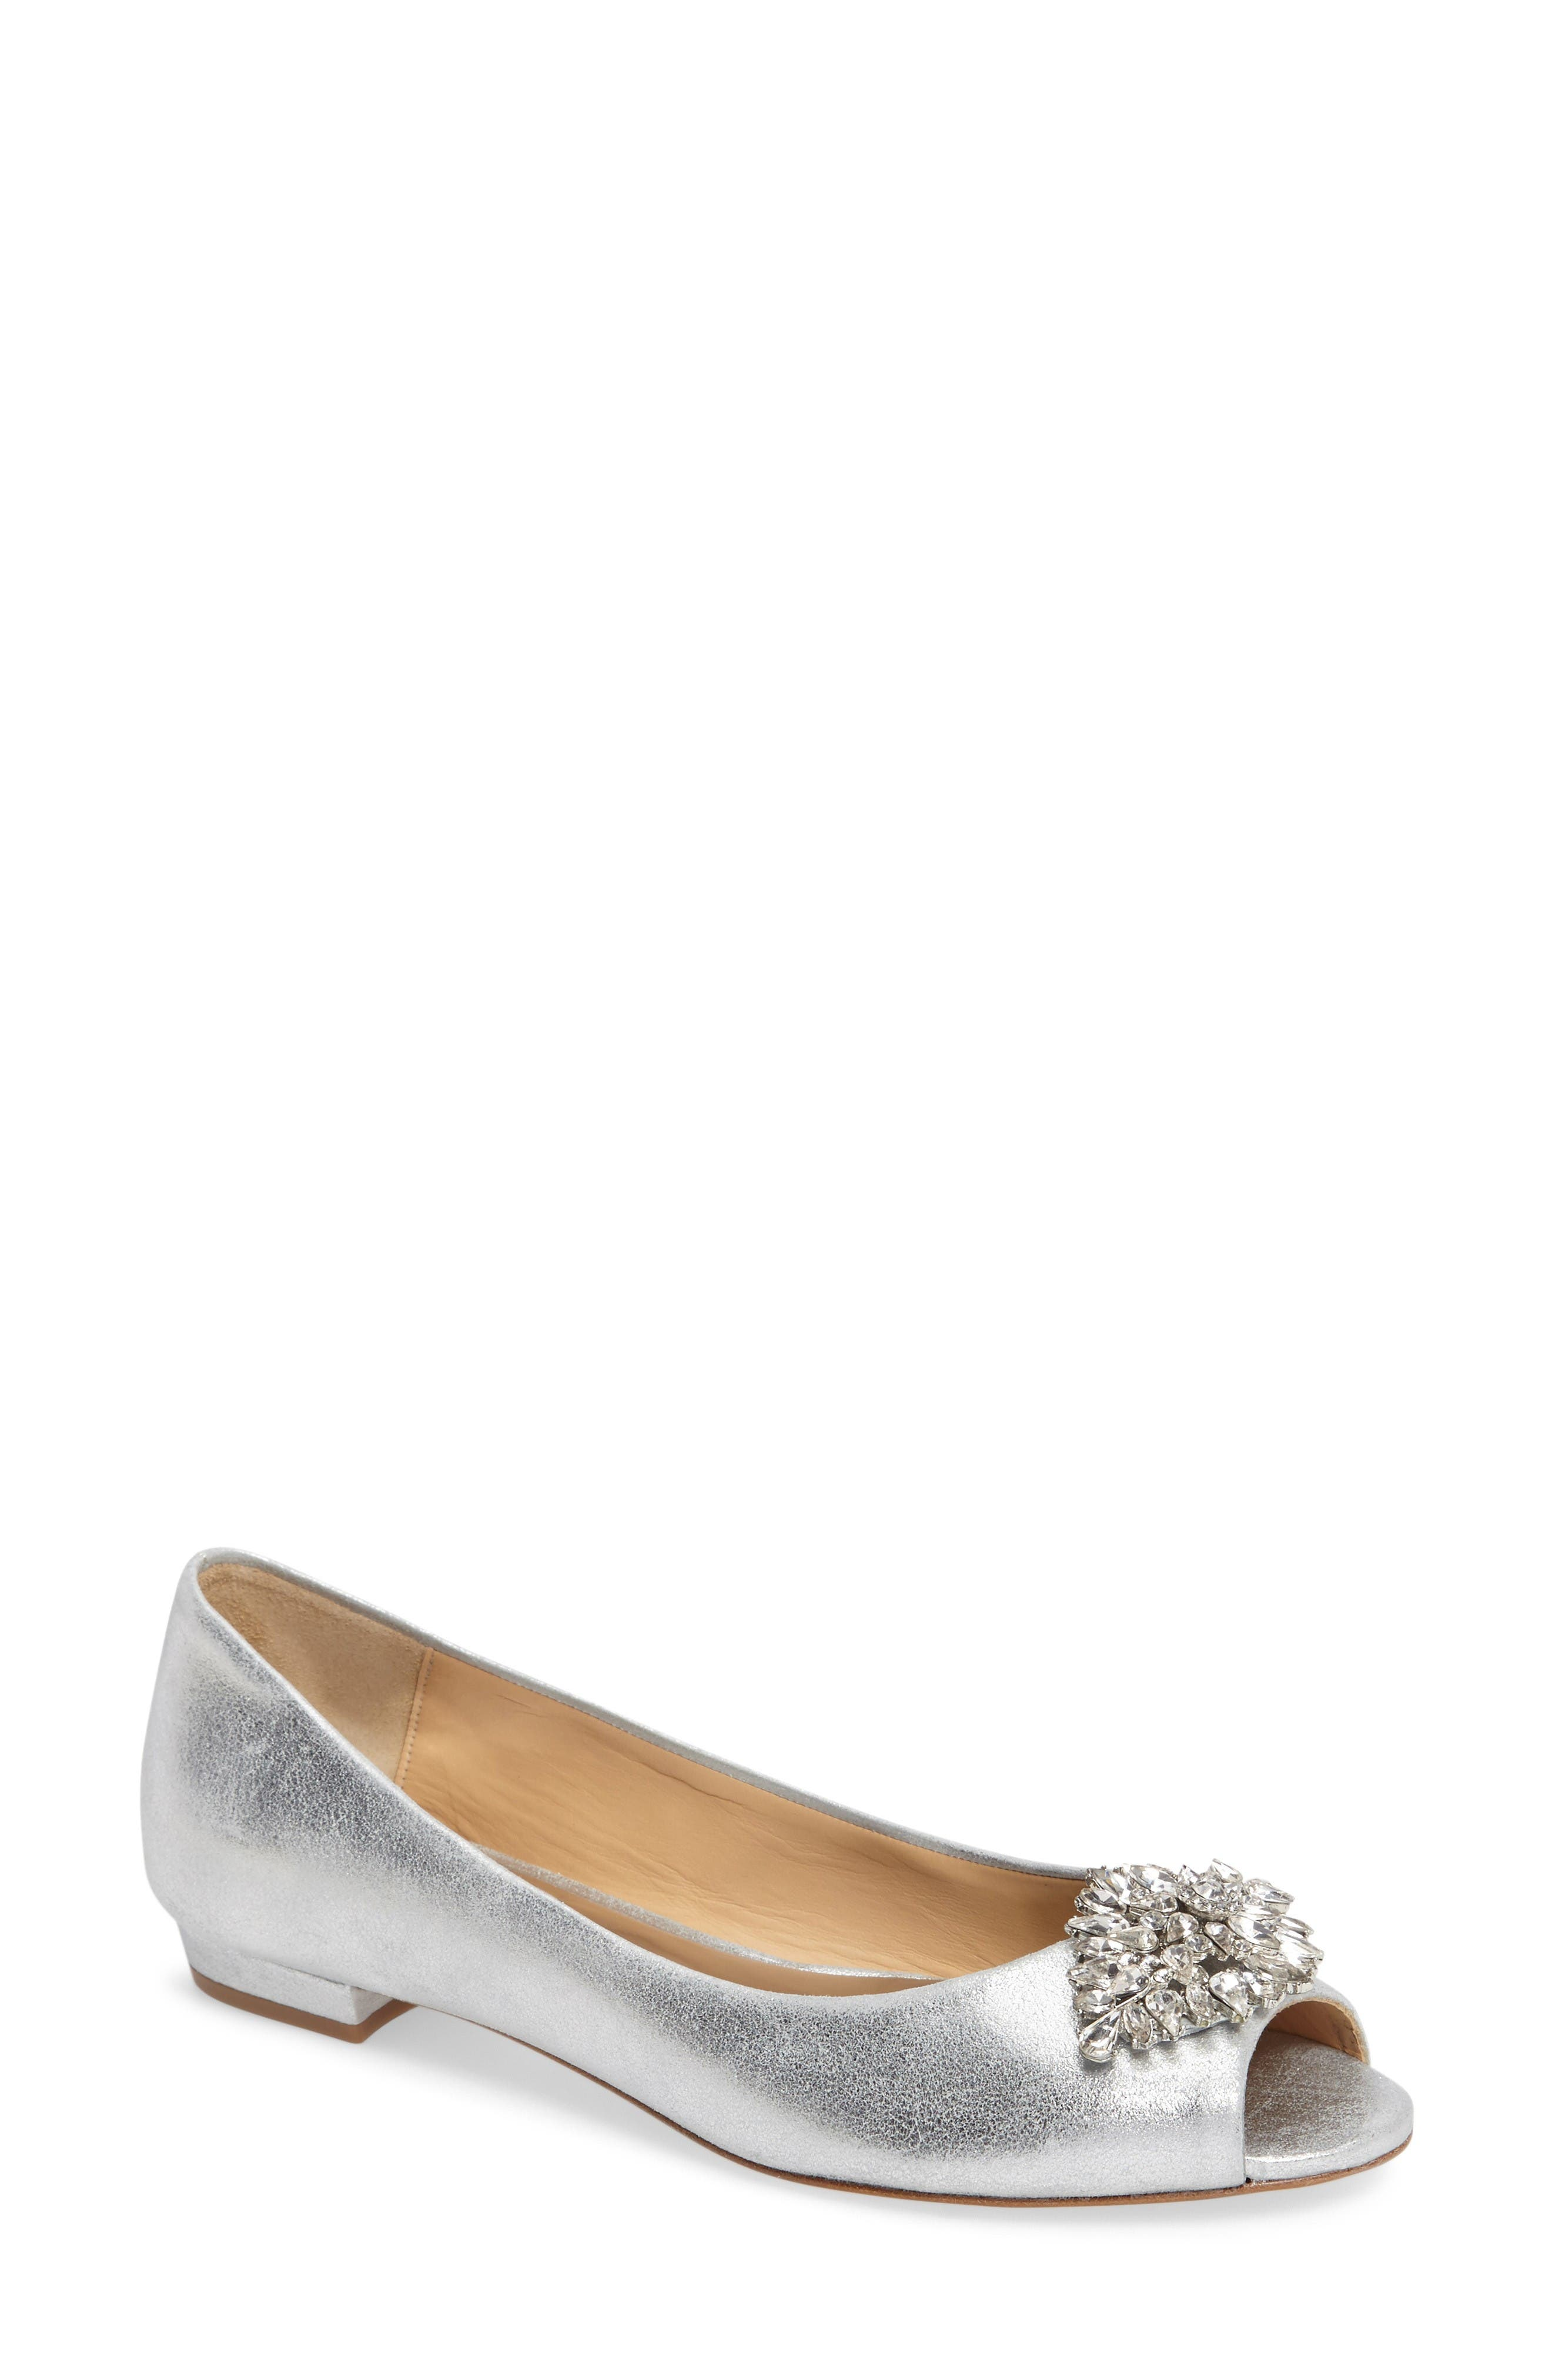 Taft Peep Toe Flat,                         Main,                         color, Silver Metallic Suede